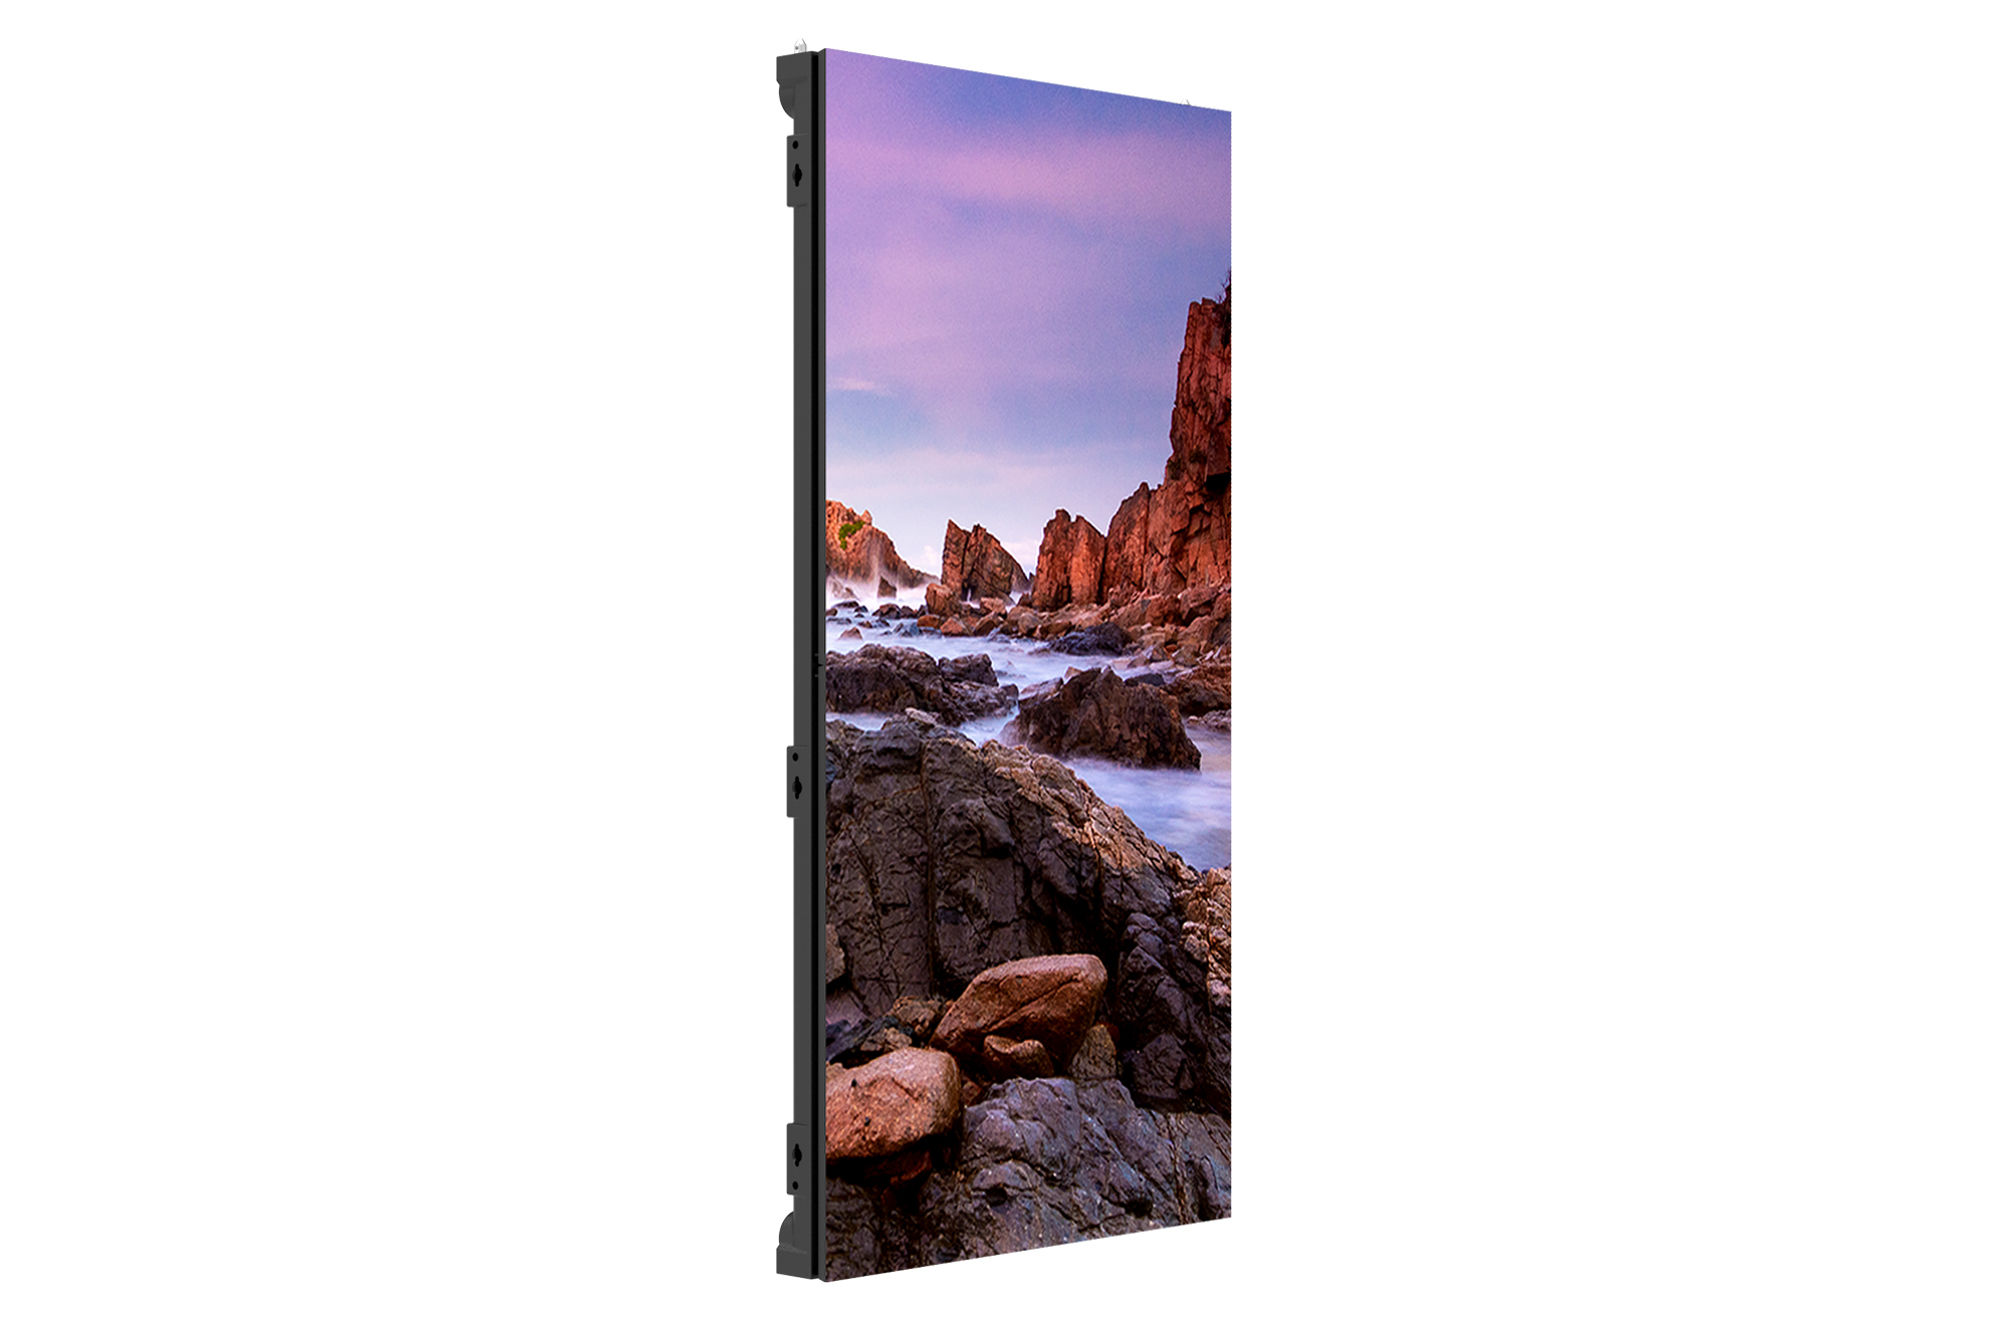 LG Versatile LSCA029 2